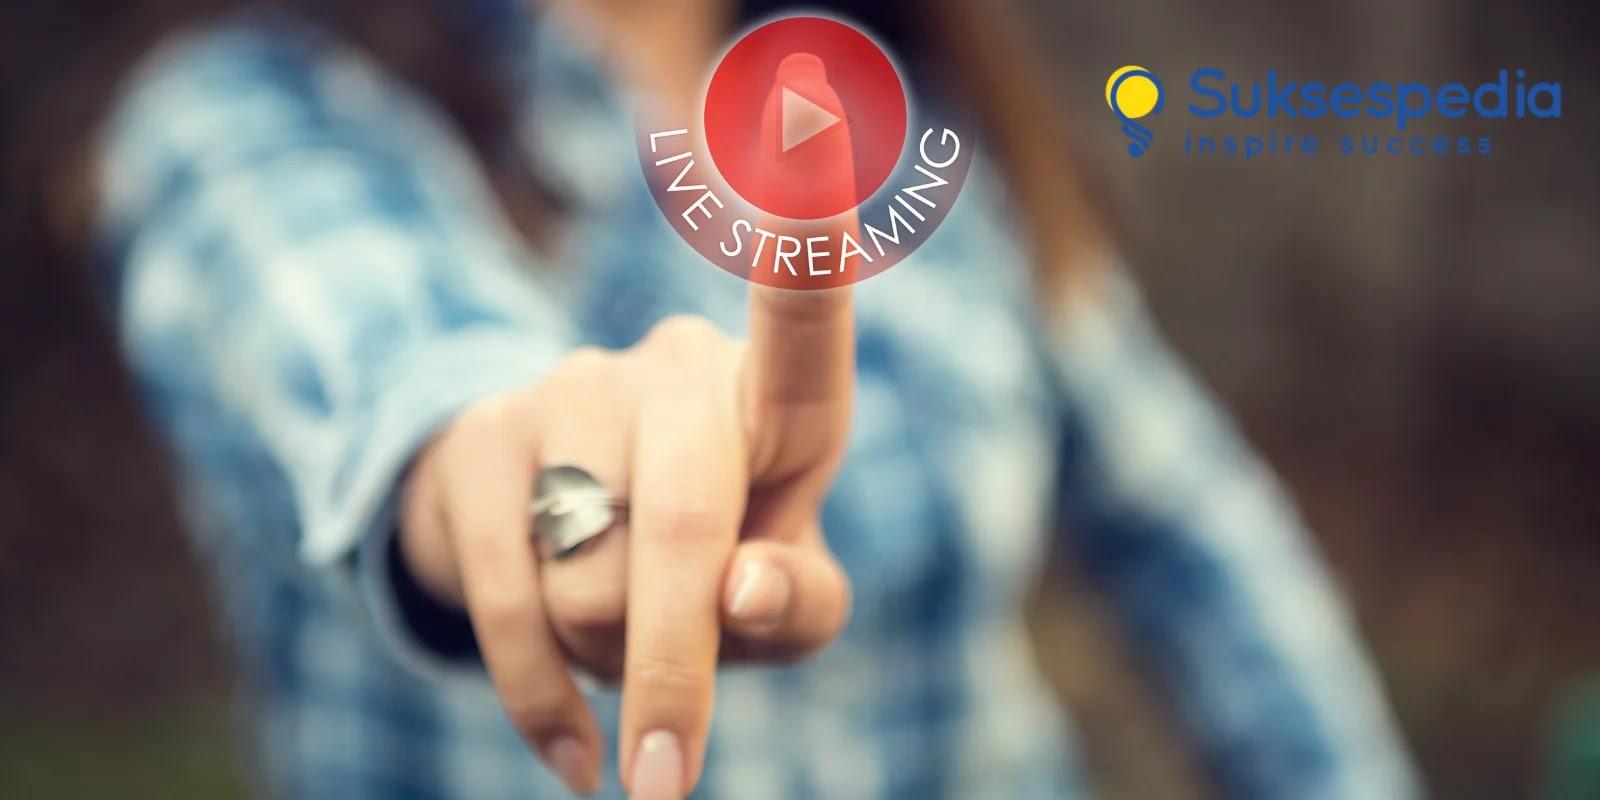 Cara Live Streaming YouTube Setelah Verifikasi Kode